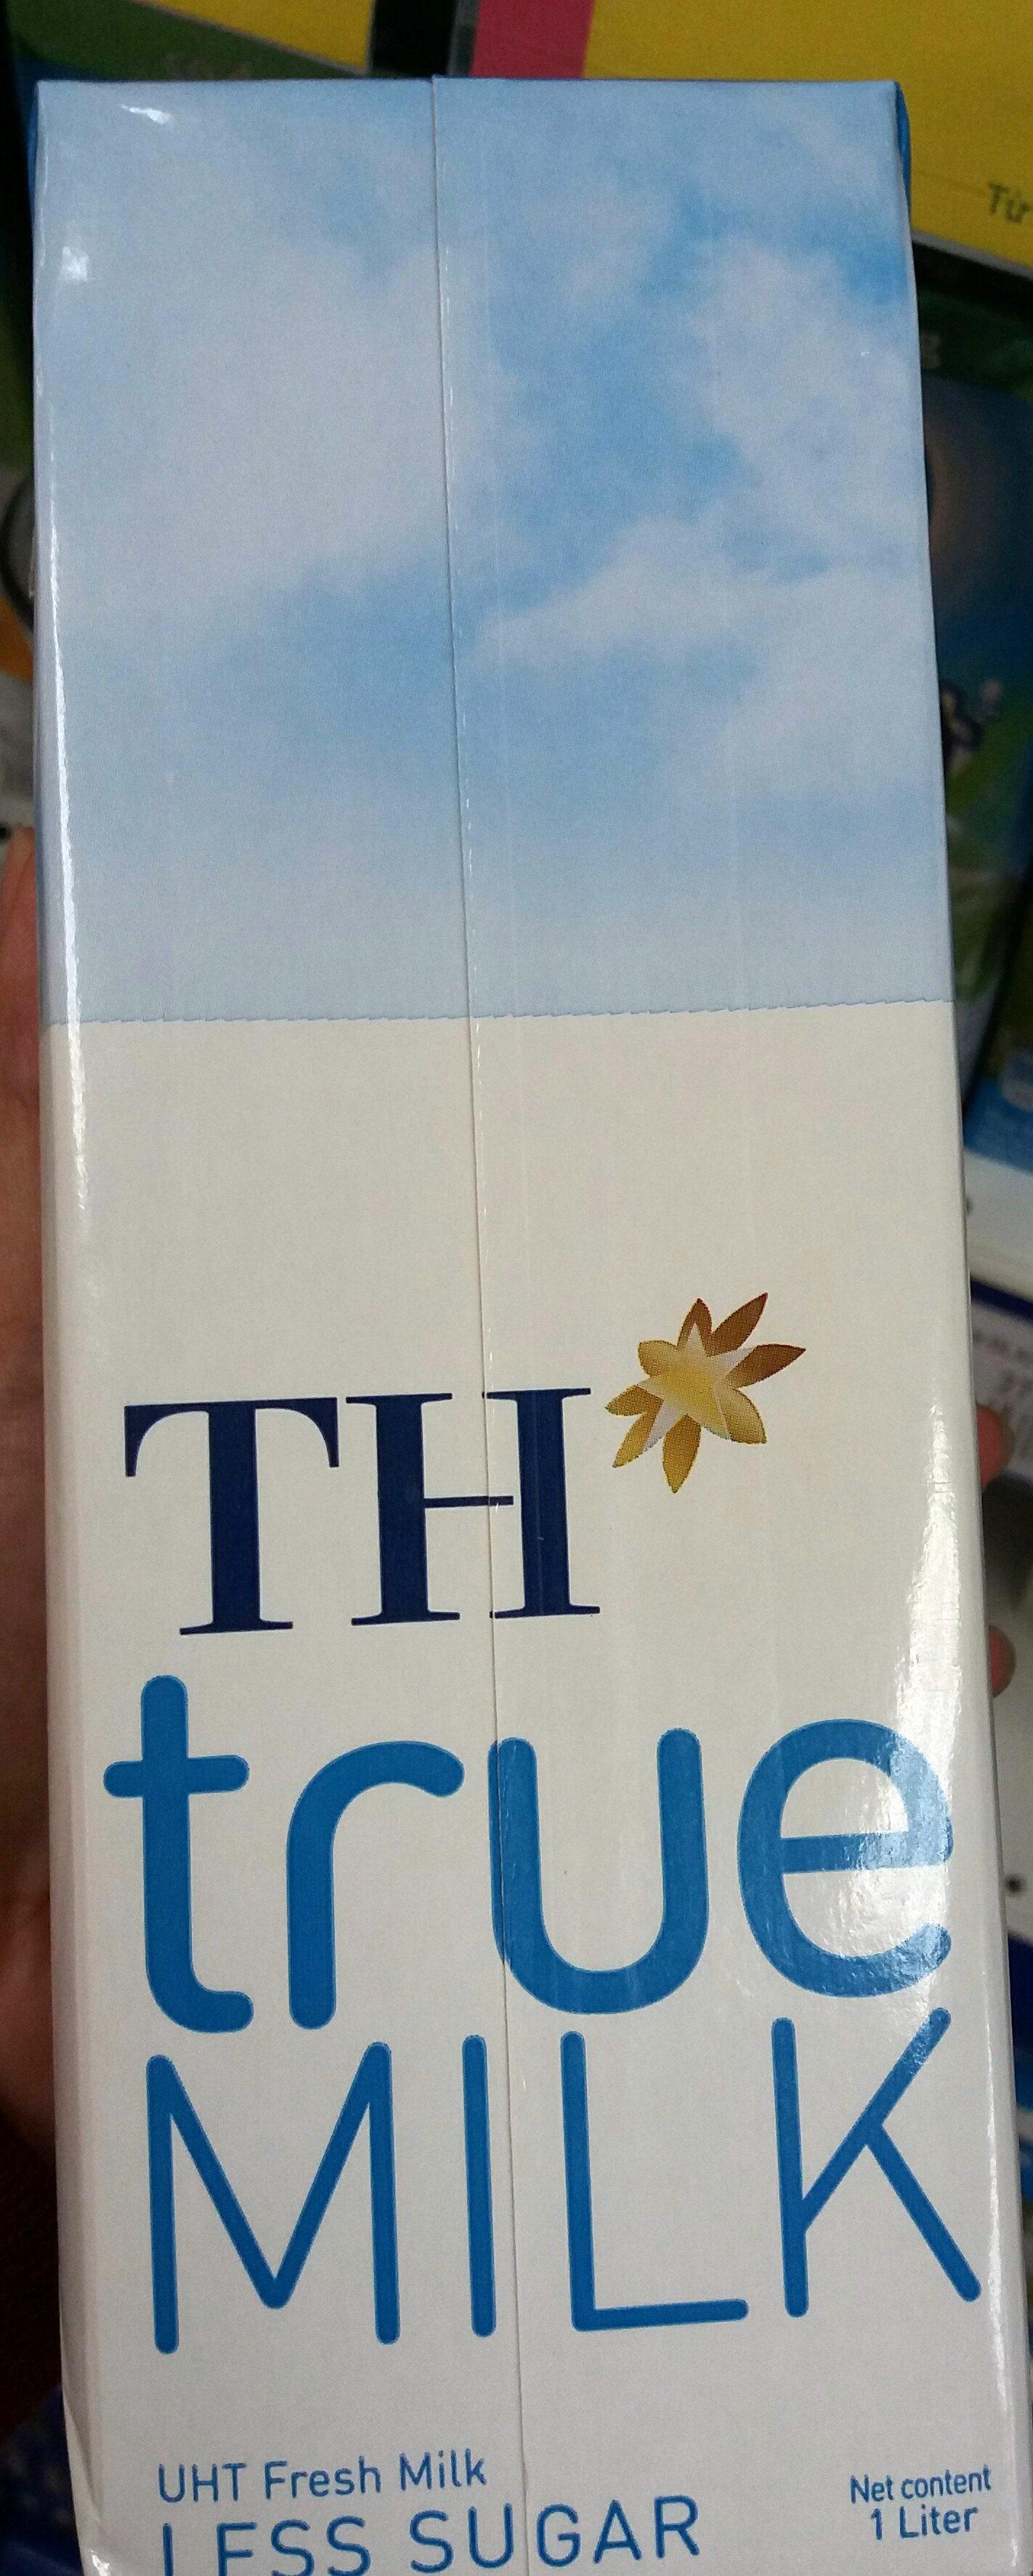 fresh milk less sugar - Sản phẩm - vi